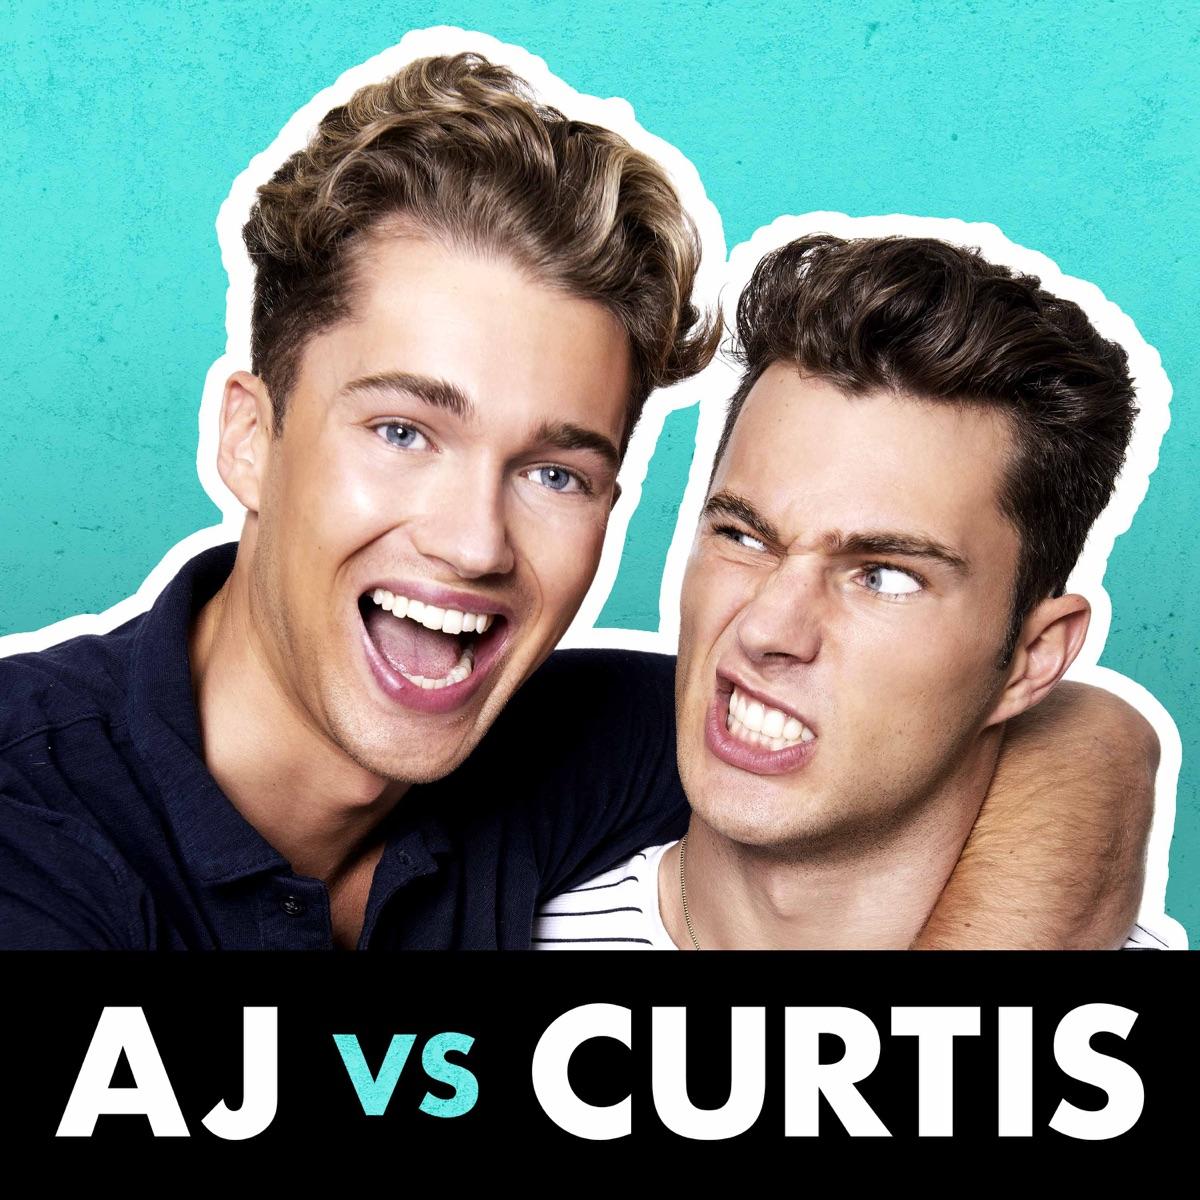 AJ vs Curtis